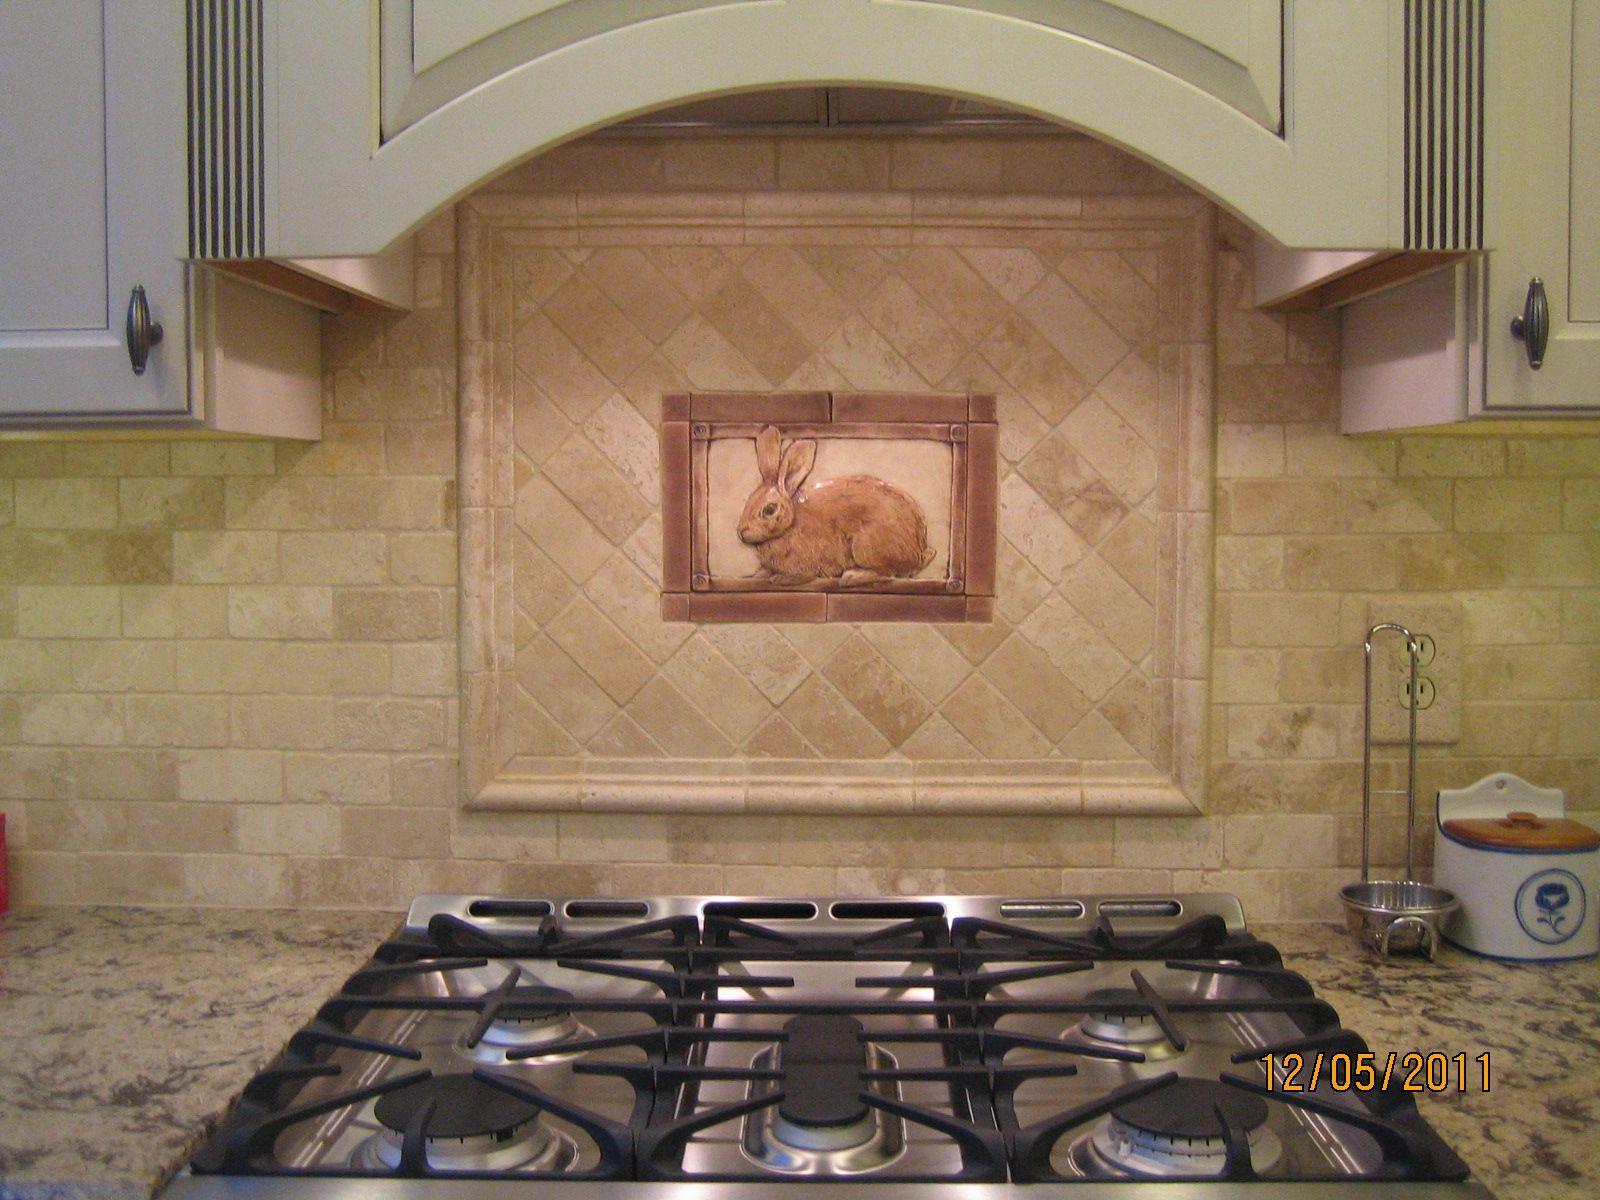 decorative tiles for kitchen unique cabinet pulls tiled backsplash with handcrafted rabbit tile as